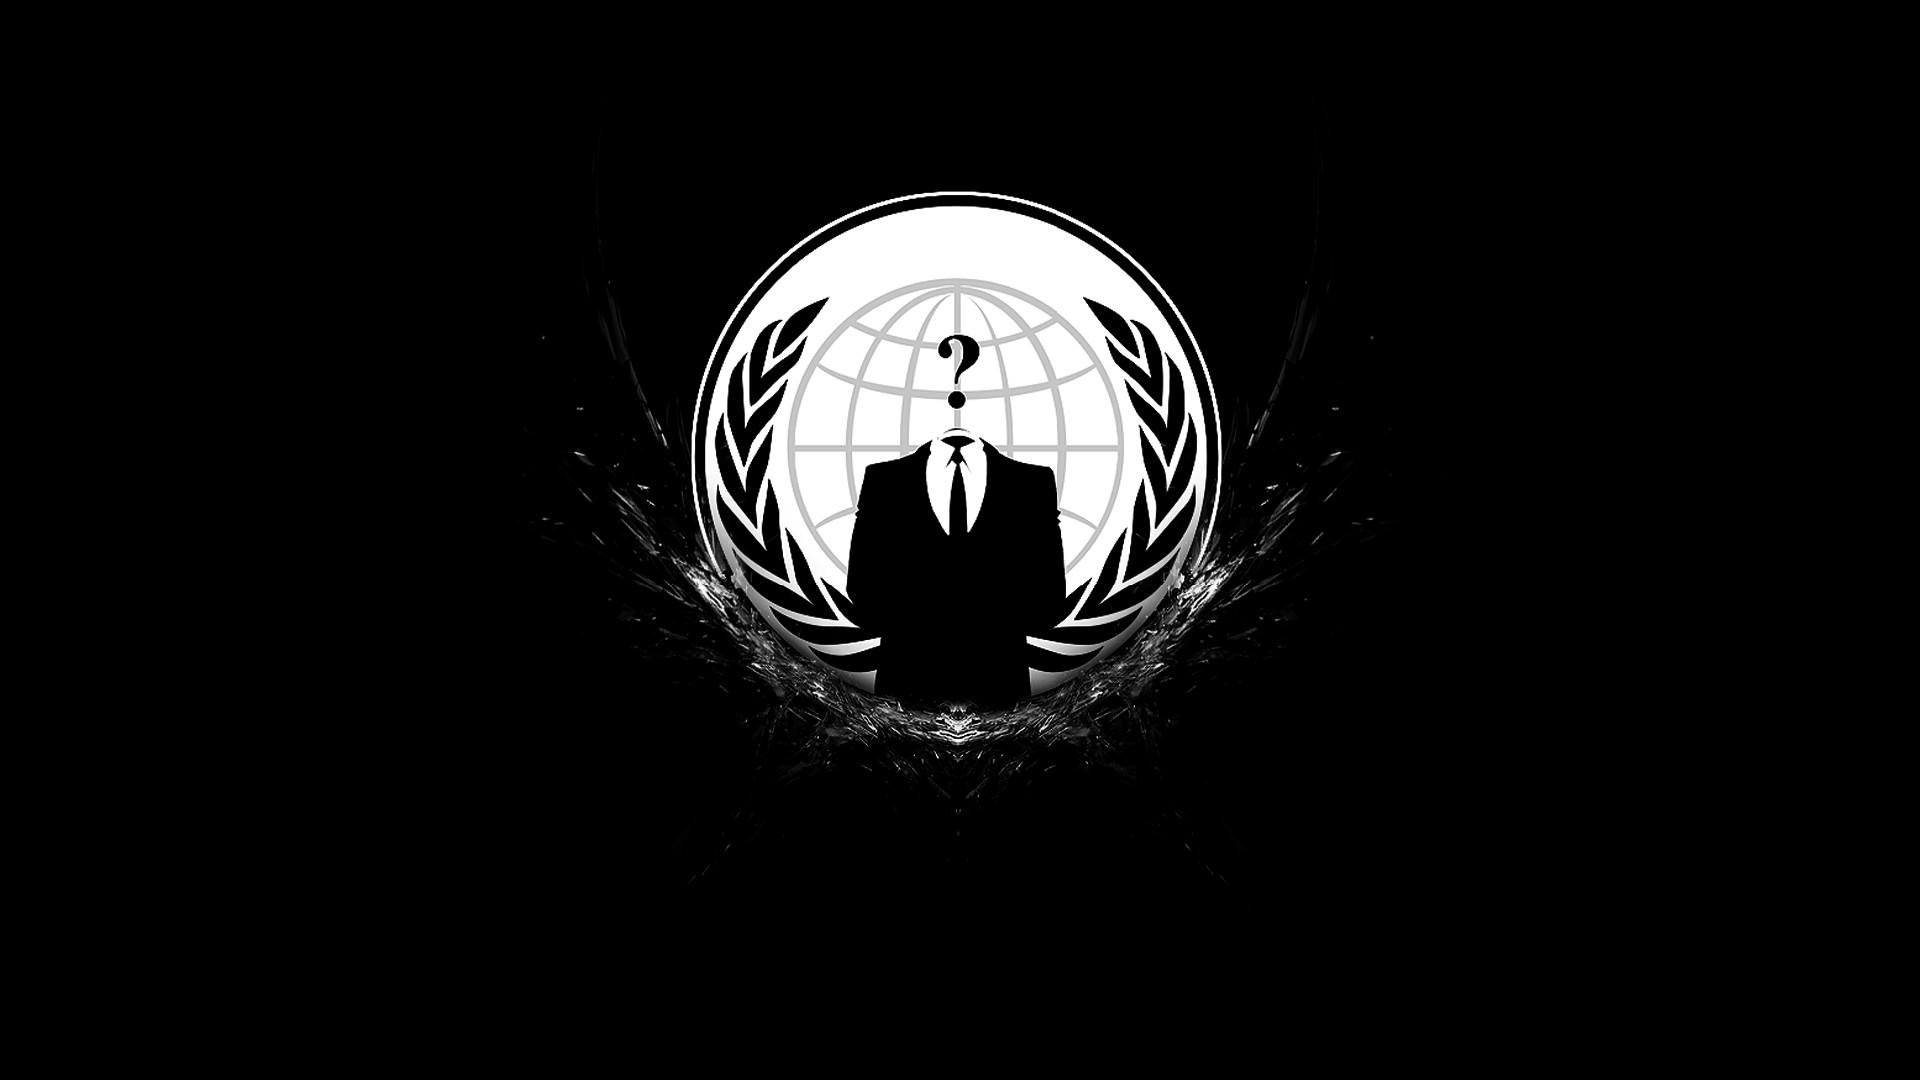 71 Anonymous Hd